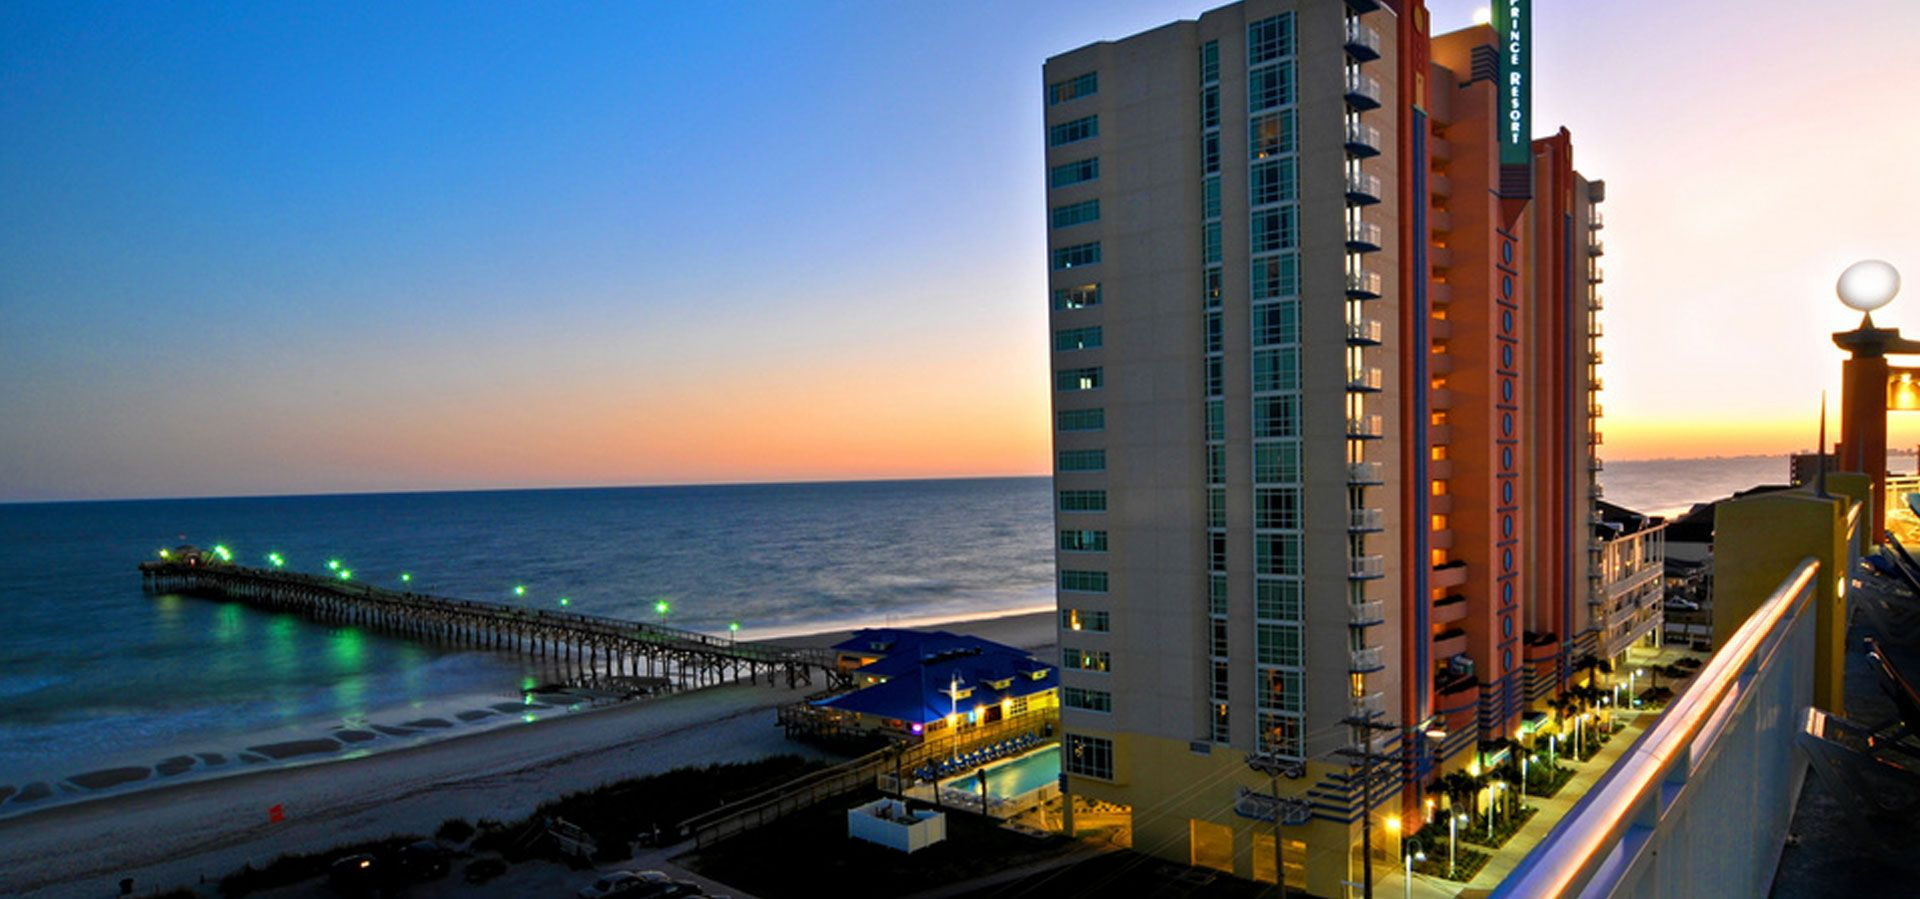 North Myrtle Beach Resorts Hotels Prince Resort Of Cherry Grove